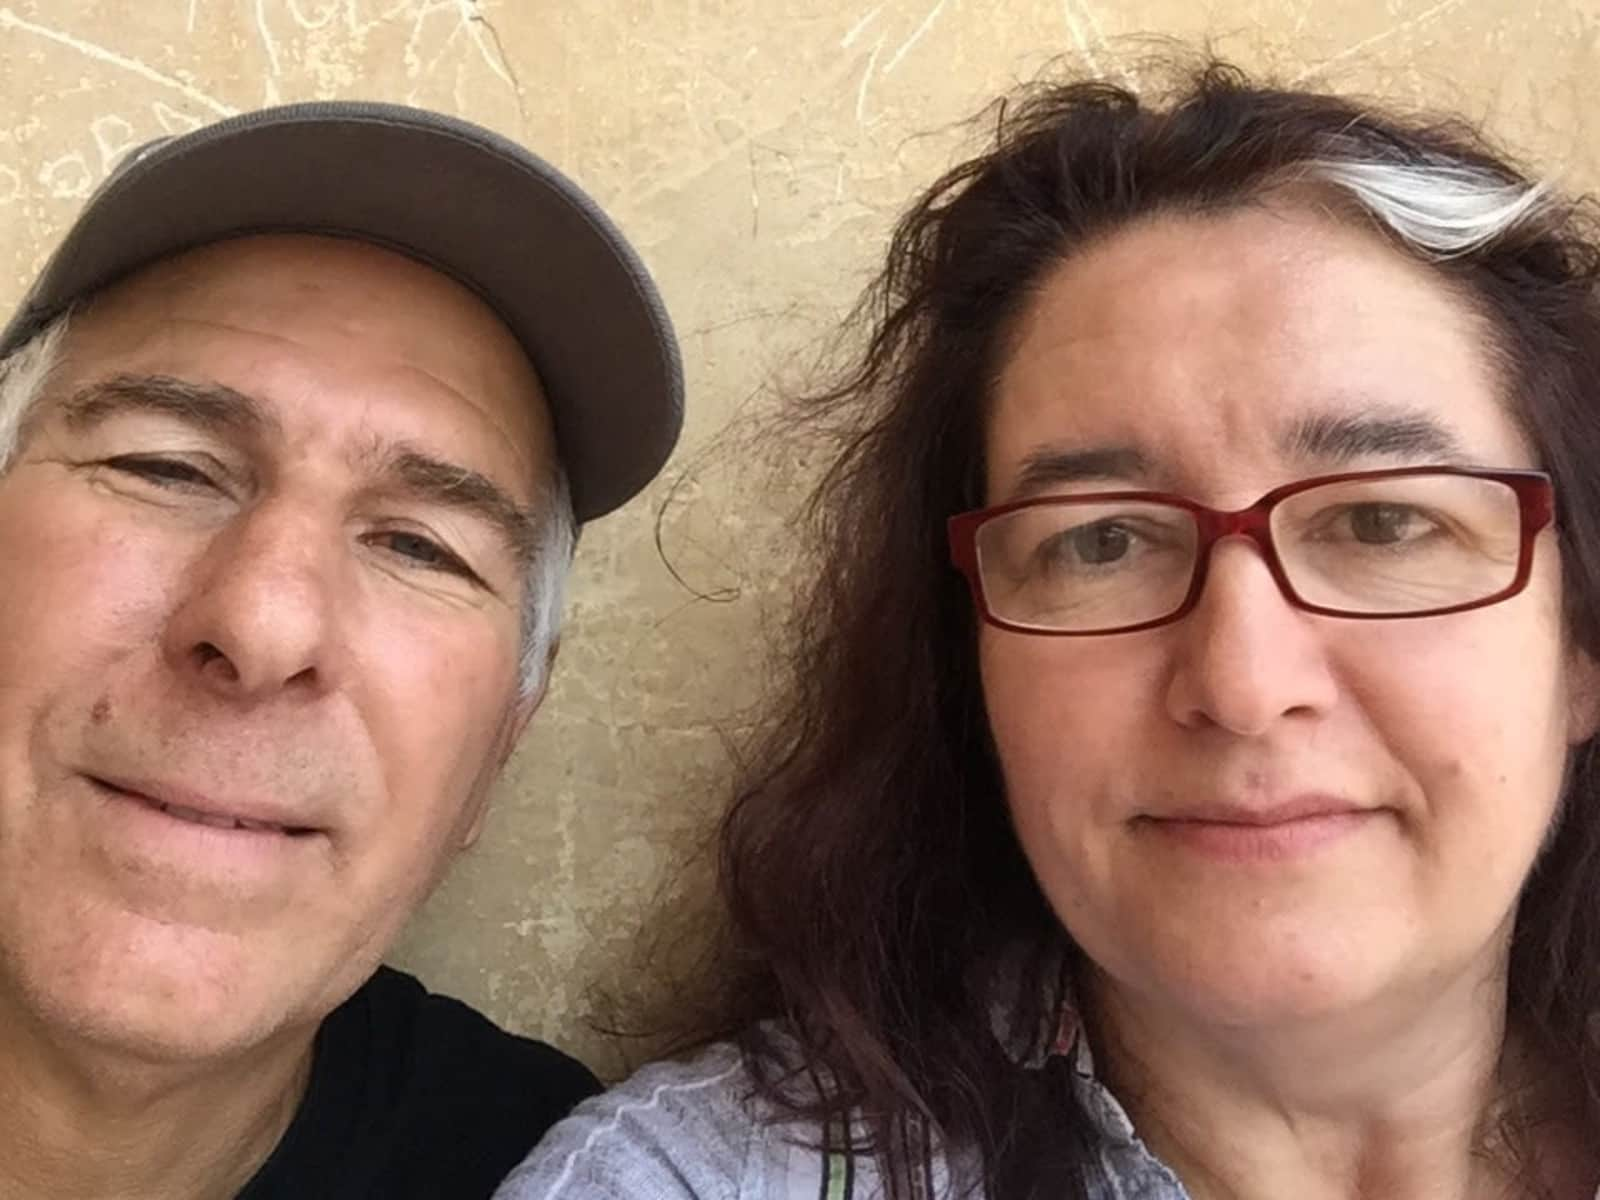 Renske & John from Altona North, Victoria, Australia